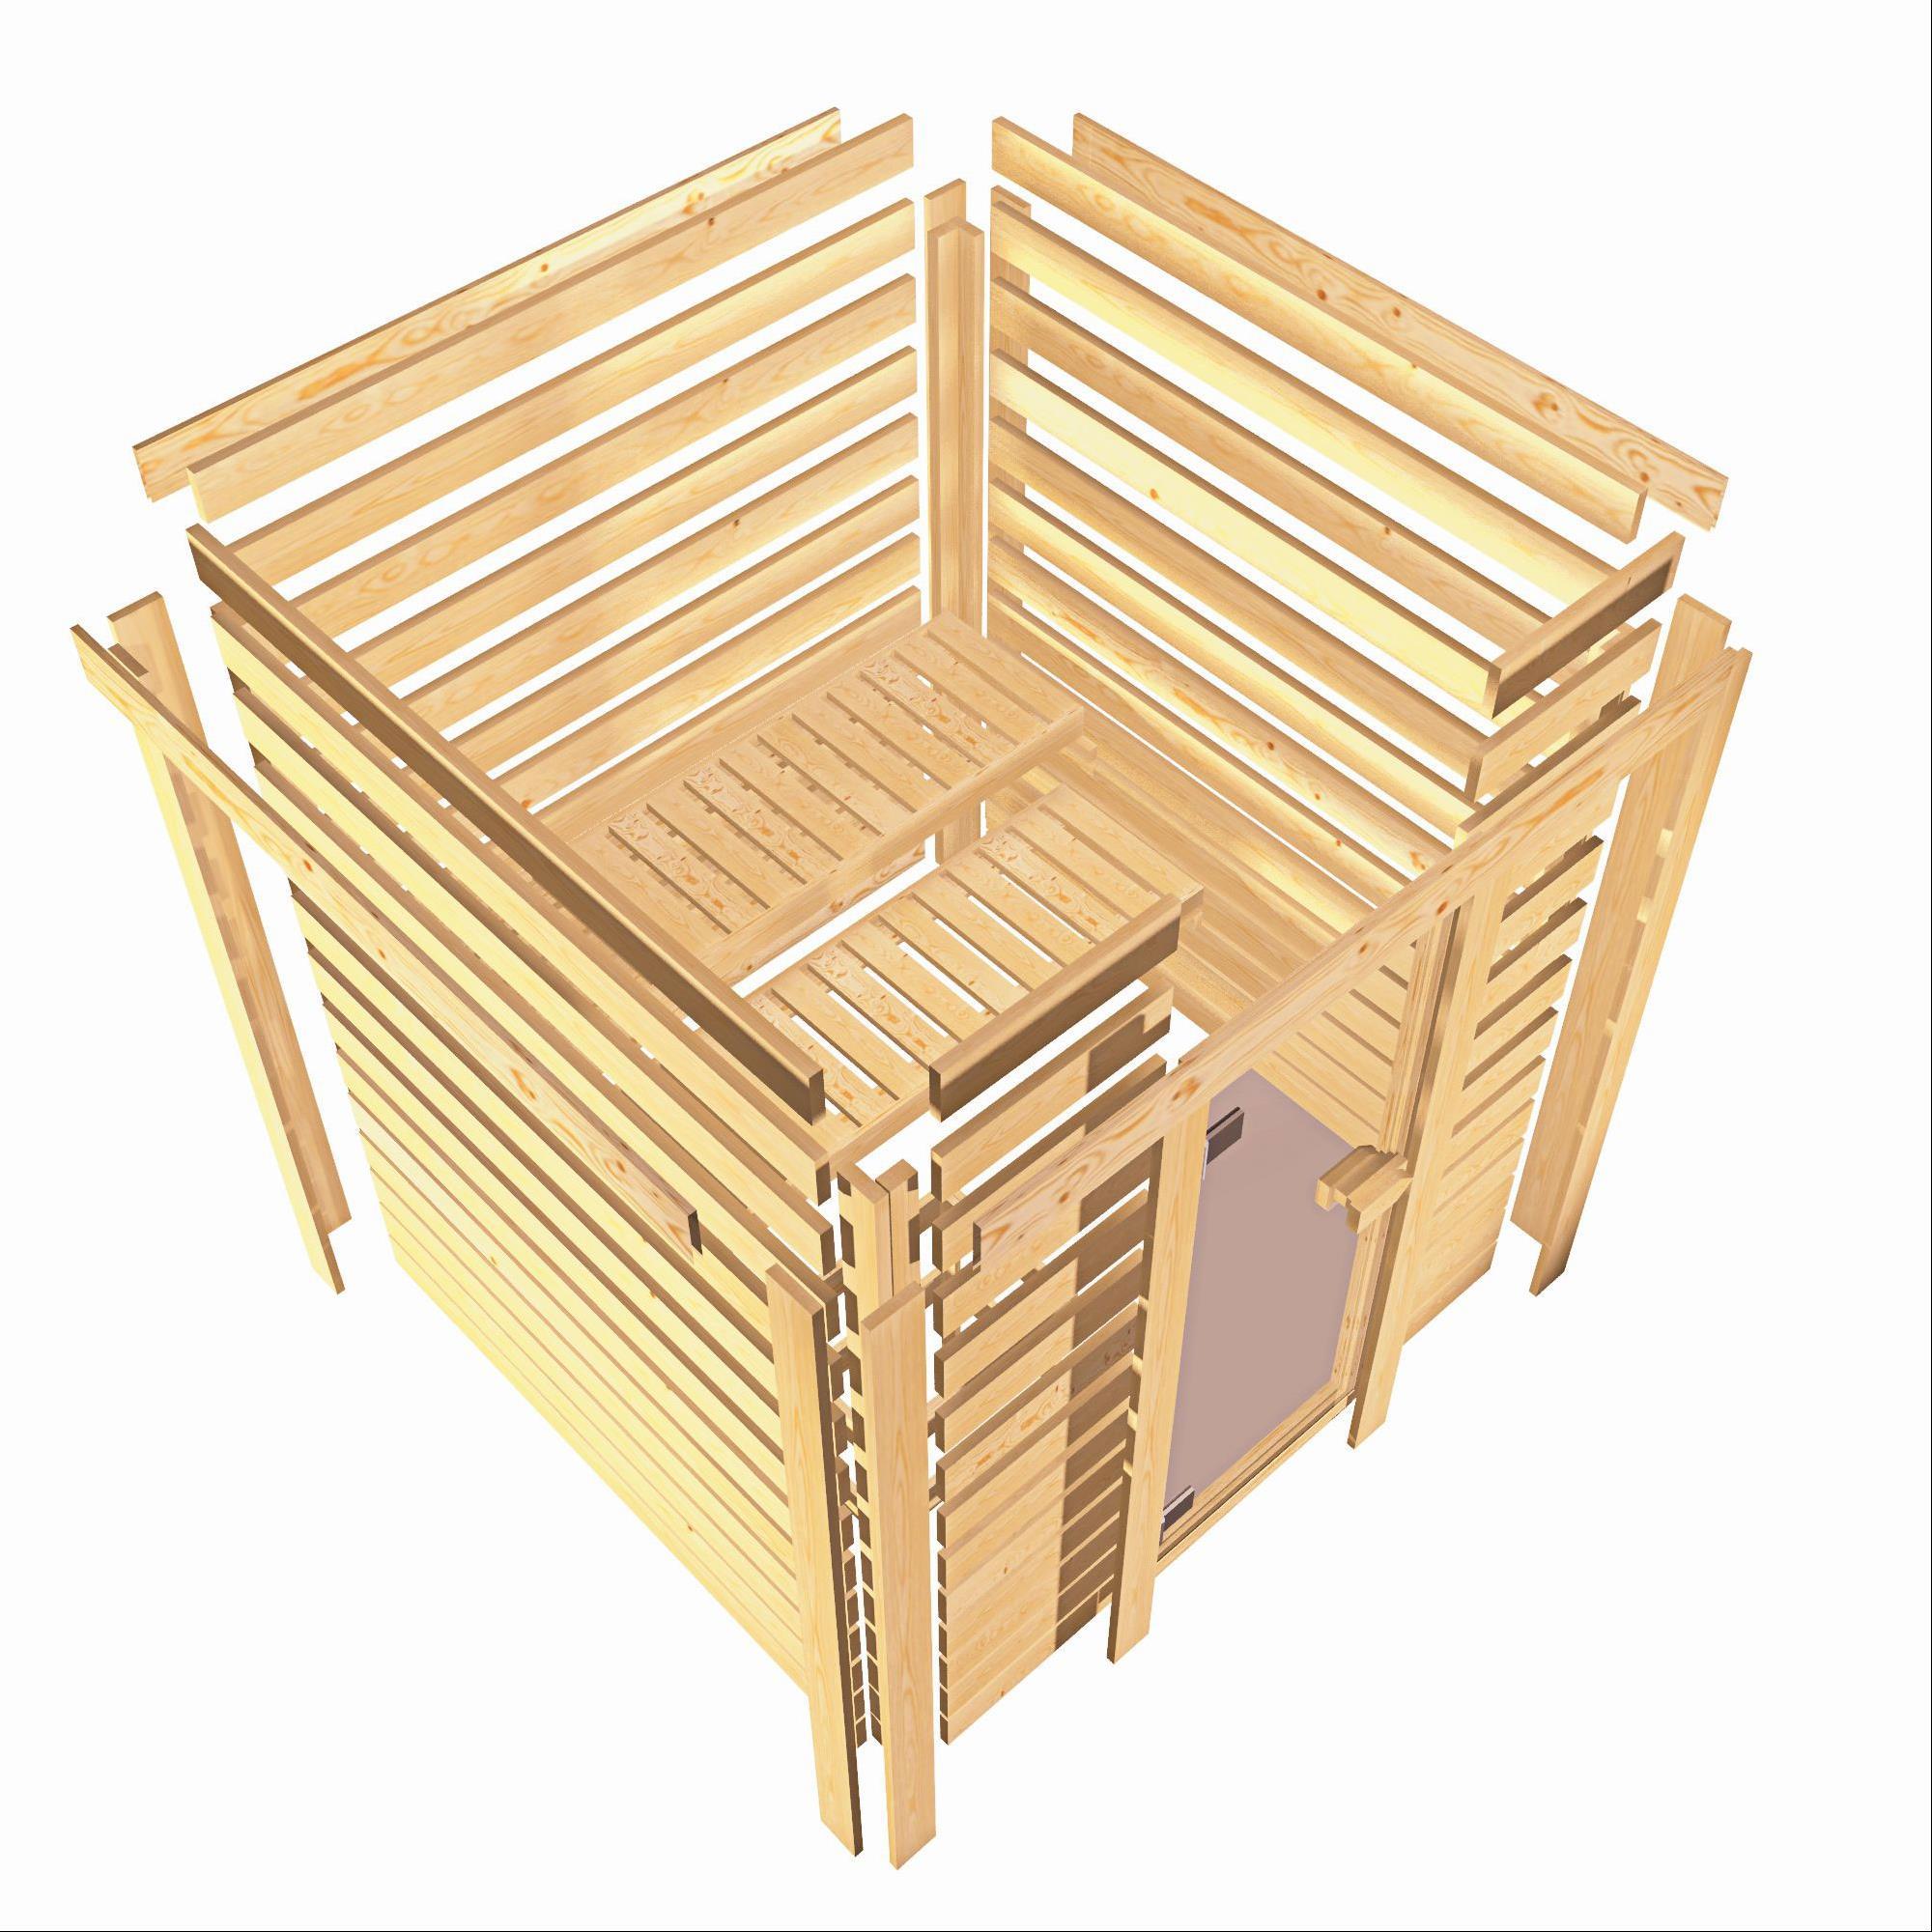 WoodFeeling Sauna Mia 38mm Bio Saunofen 9kW extern Classic Tür Bild 4